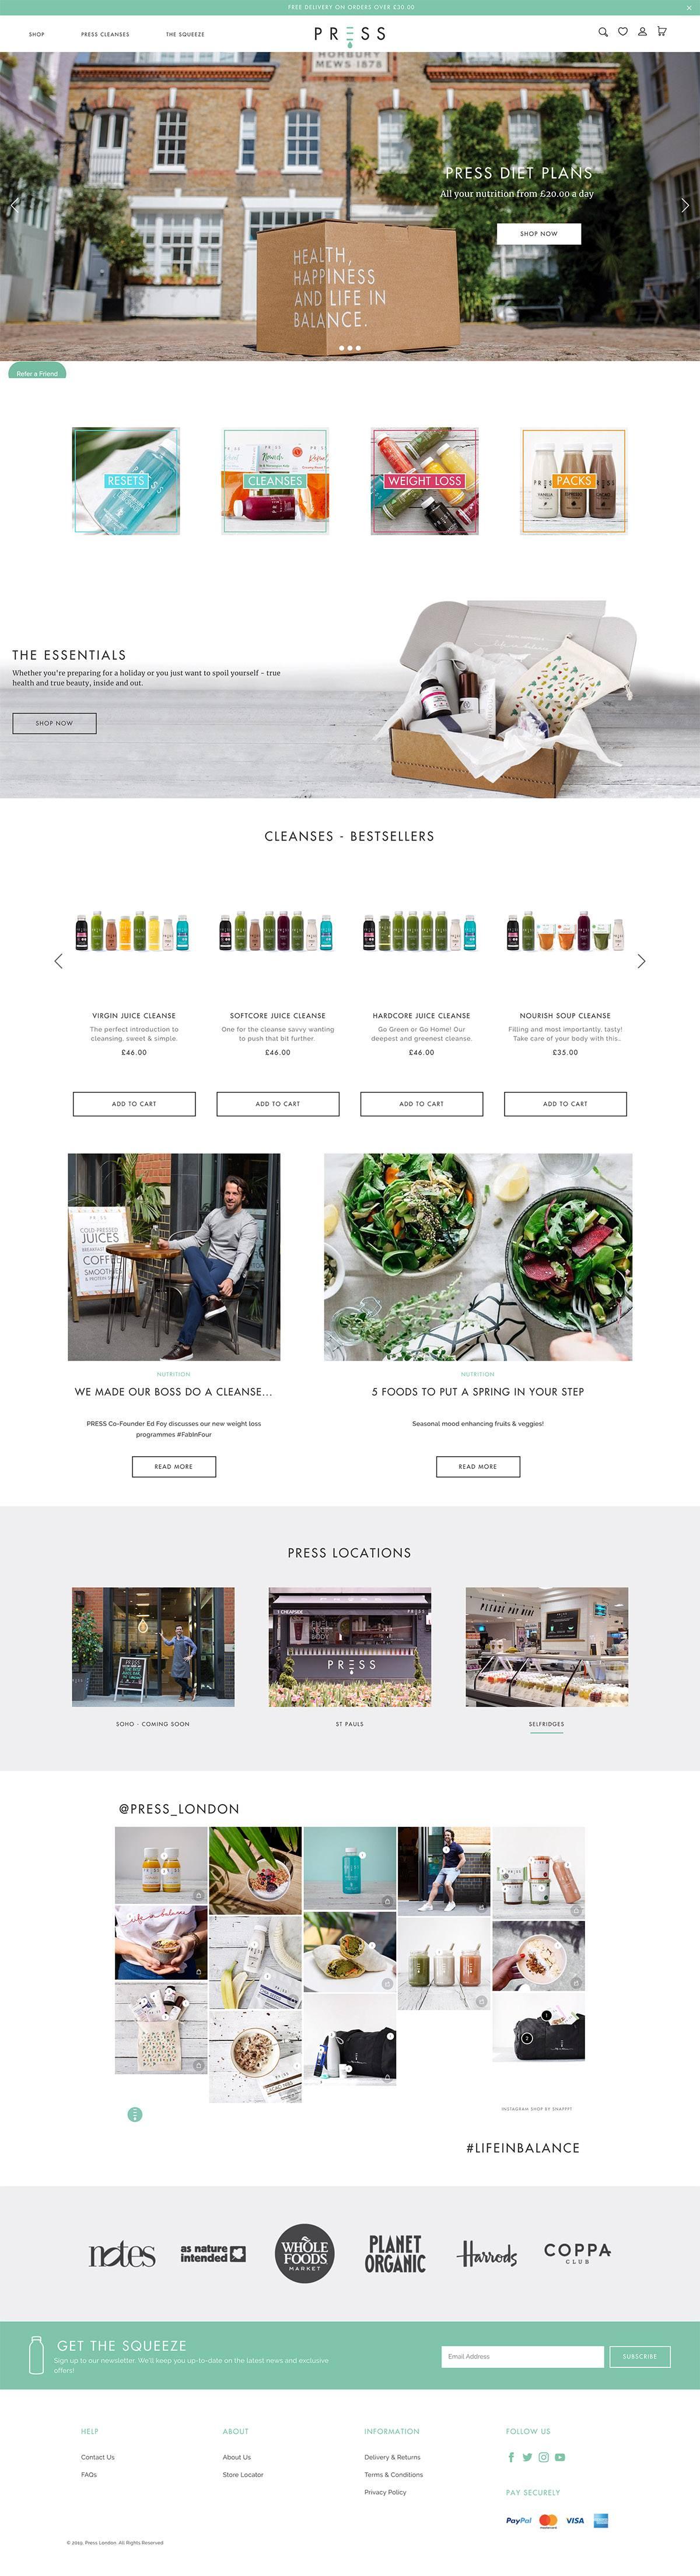 eCommerce website: Press London